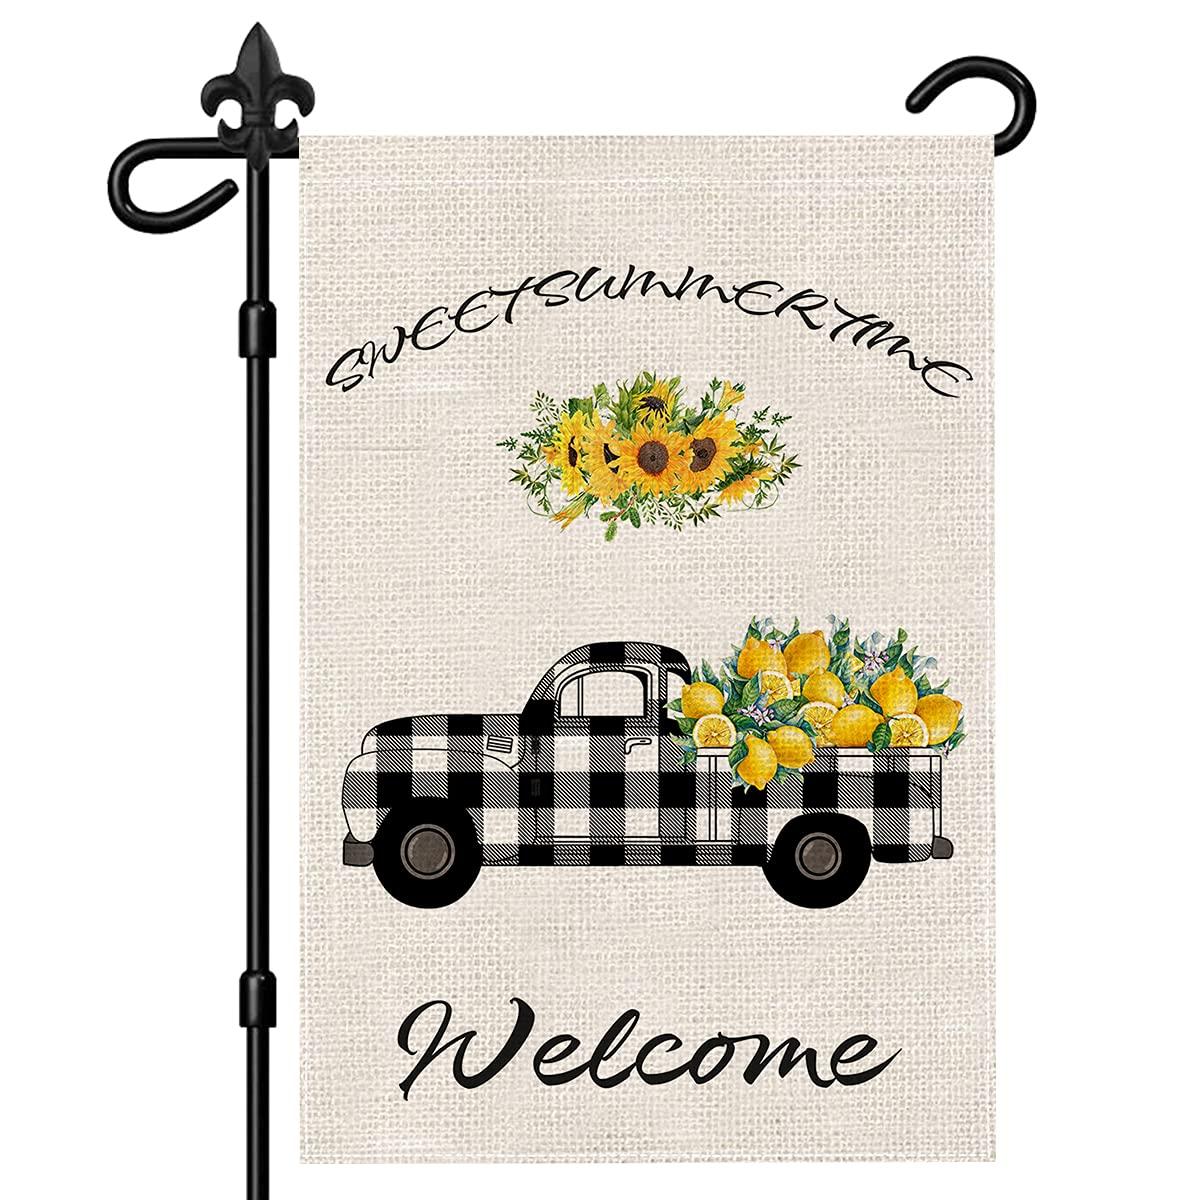 EnBrilite Sunflower Lemon Truck Welcome Garden Flag, Vertical Double-Sided Burlap Garden Flag, Rustic Truck Farmhouse Yard Flags, Spring Summer Seasonal Yard Outdoor Decoration 12*18 Inch